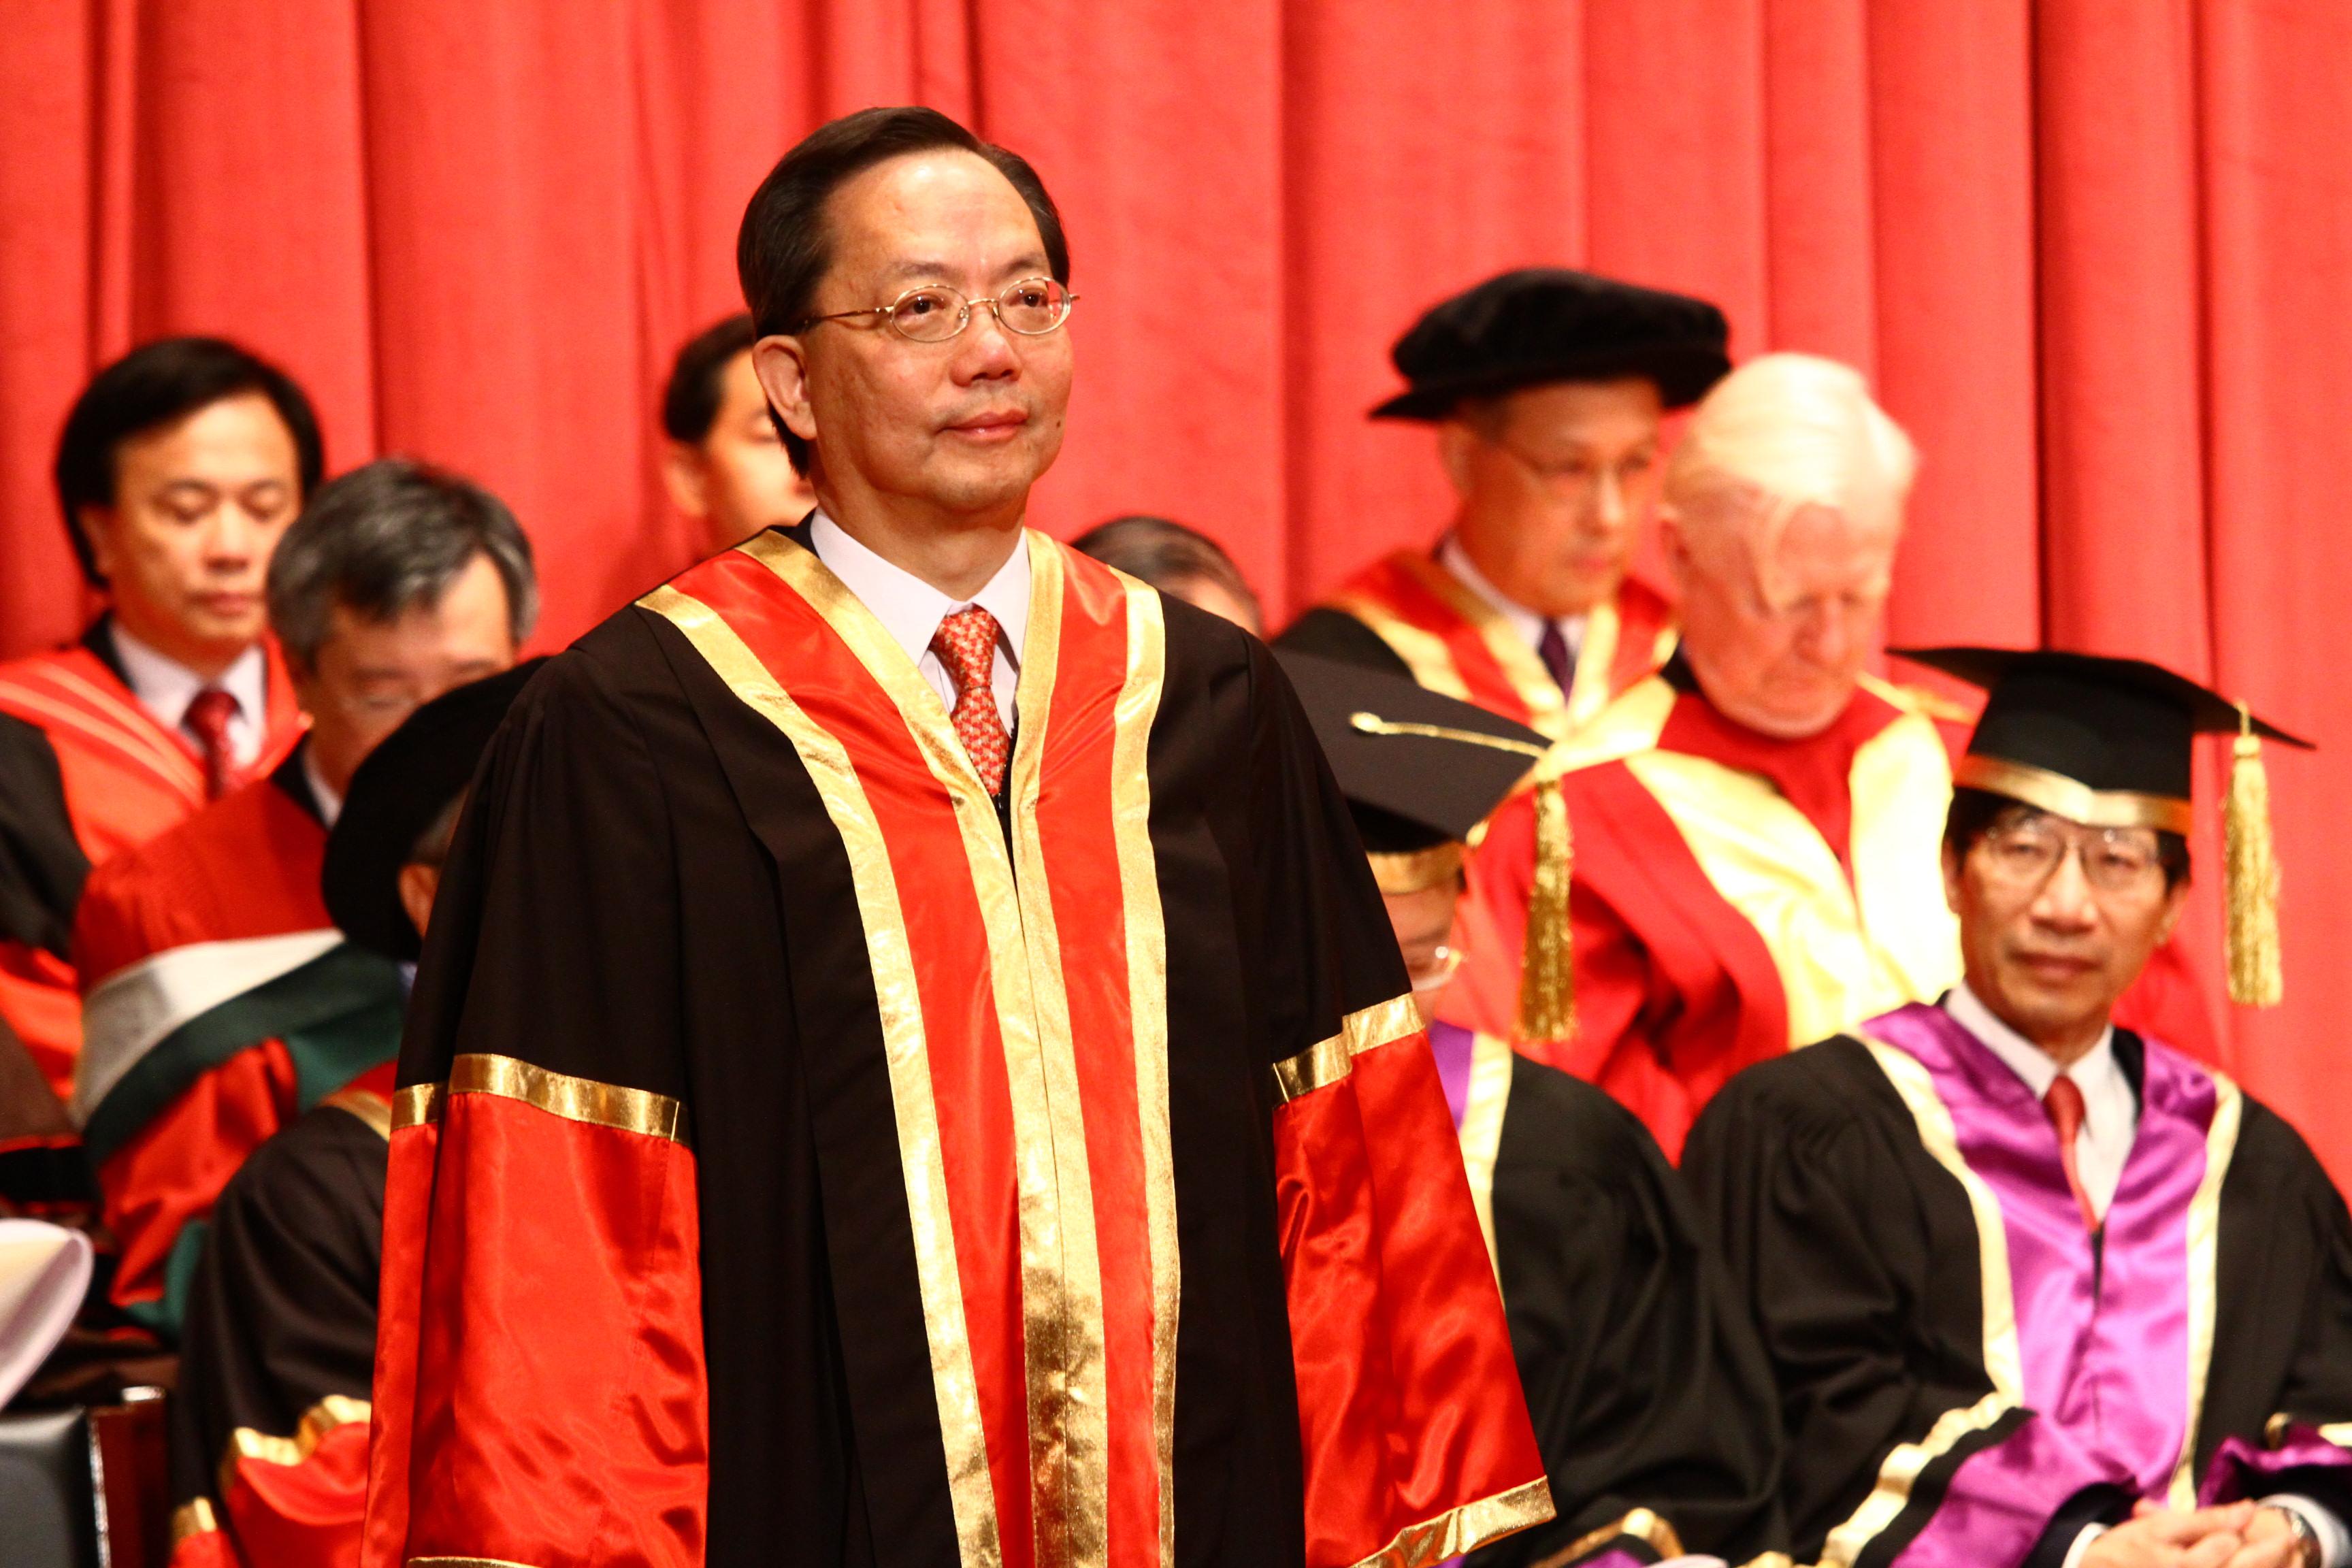 Mr. Leung Ying-wai Charles